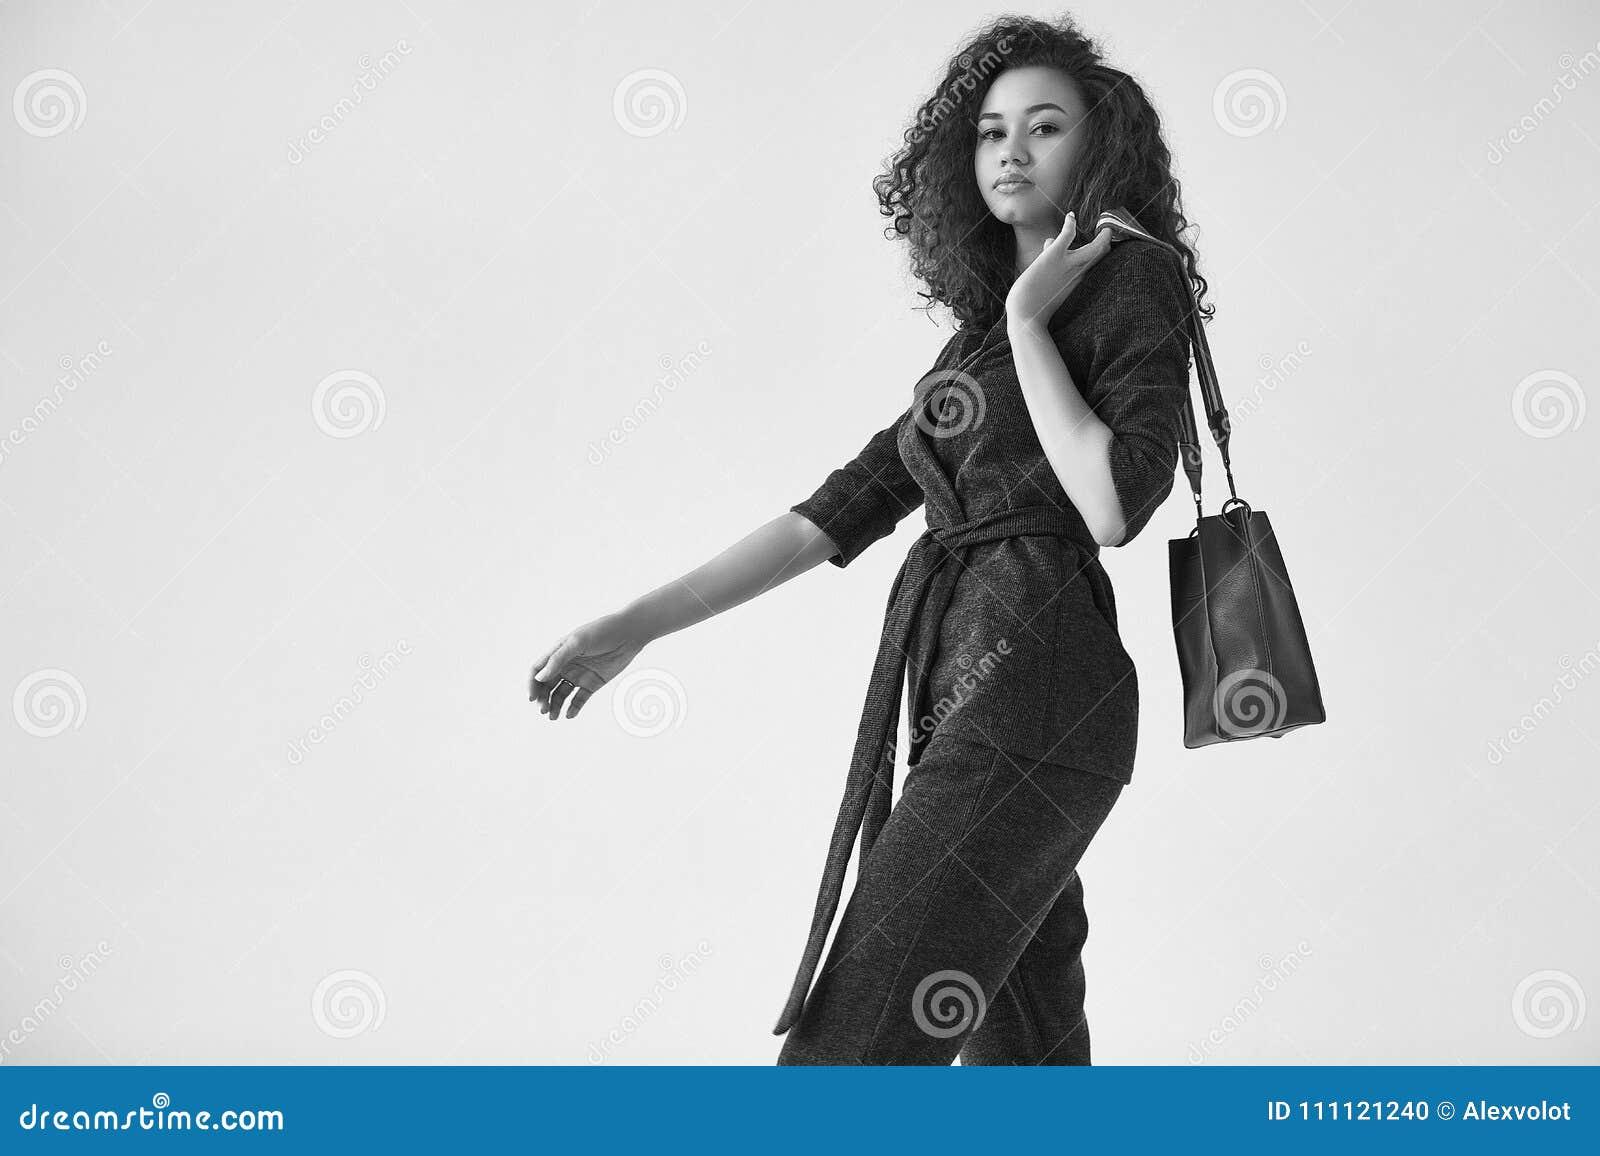 7c3142342cf3 Κομψή μαύρη γυναίκα με τη σγουρή τρίχα στο μοντέρνο πράσινο κοστούμι ...